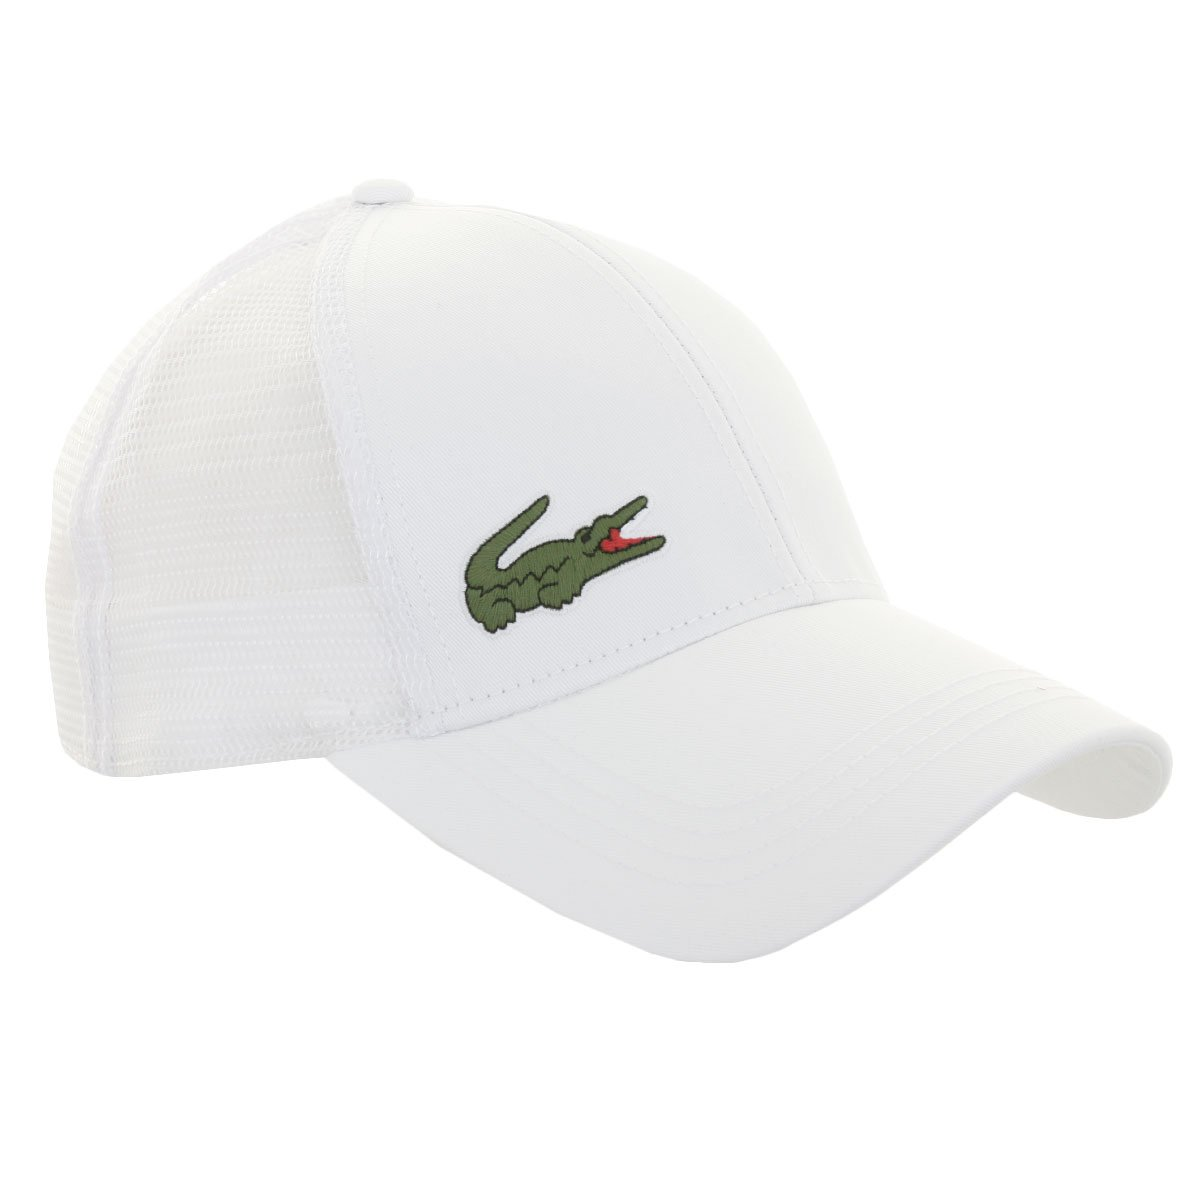 Lacoste Rk2321 Gorra de béisbol, Blanco (Blanc), Talla única ...